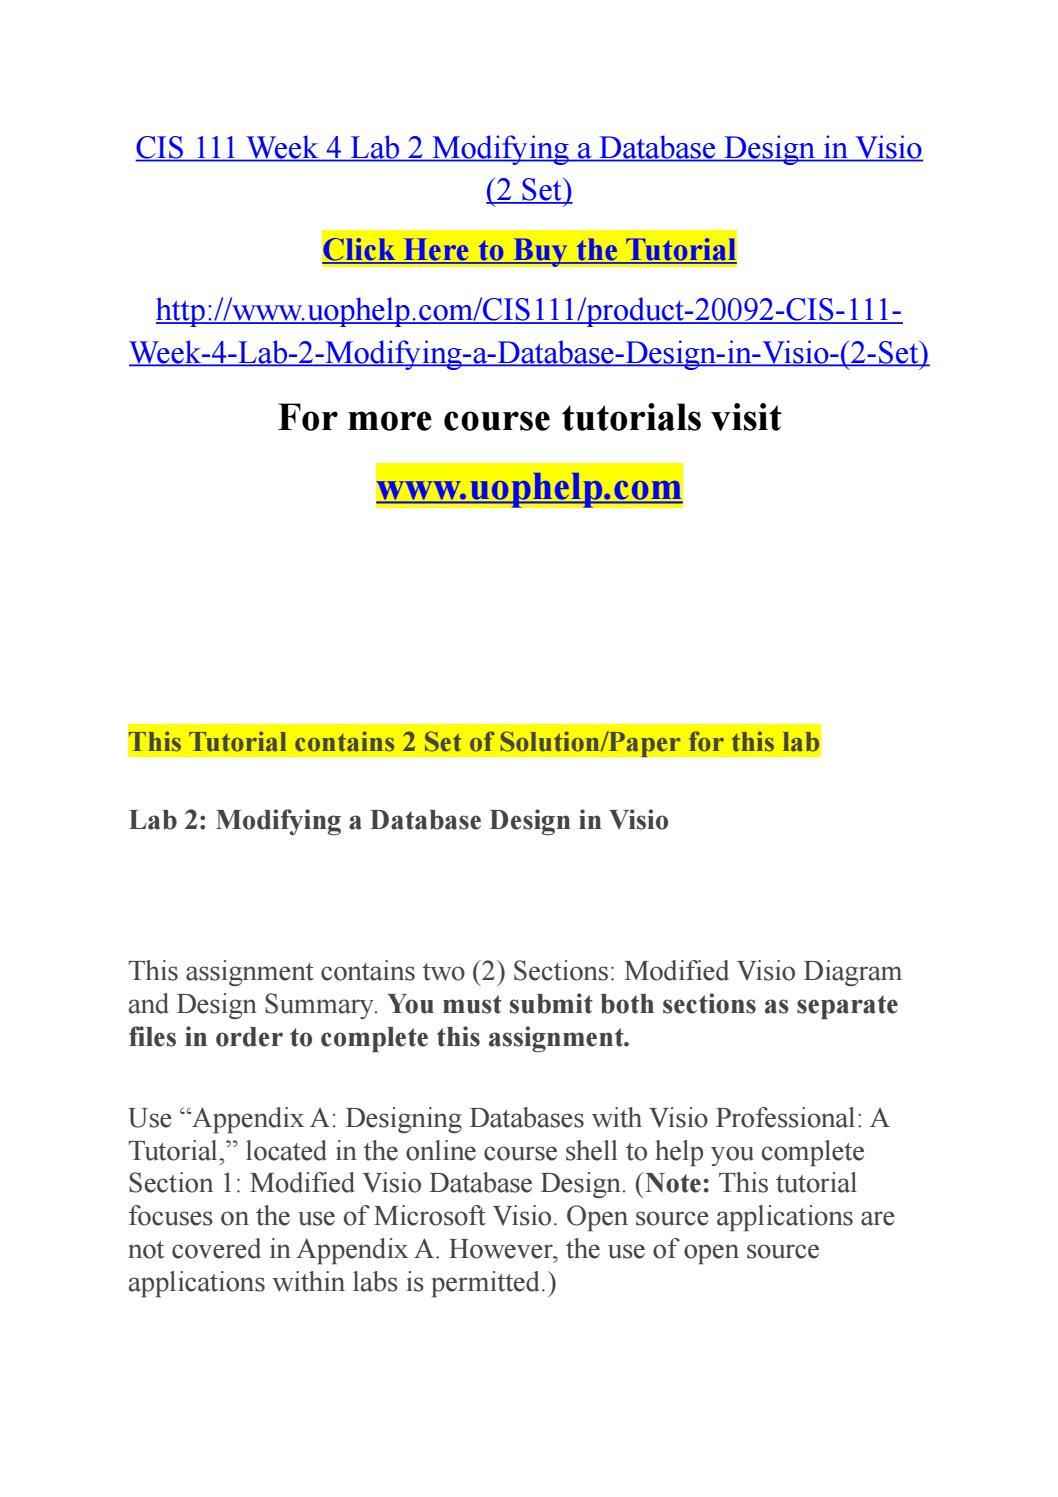 cis 111 week 4 lab 2 modifying a database design in visio 2 set by chcyihiuck issuu - Visio Opensource